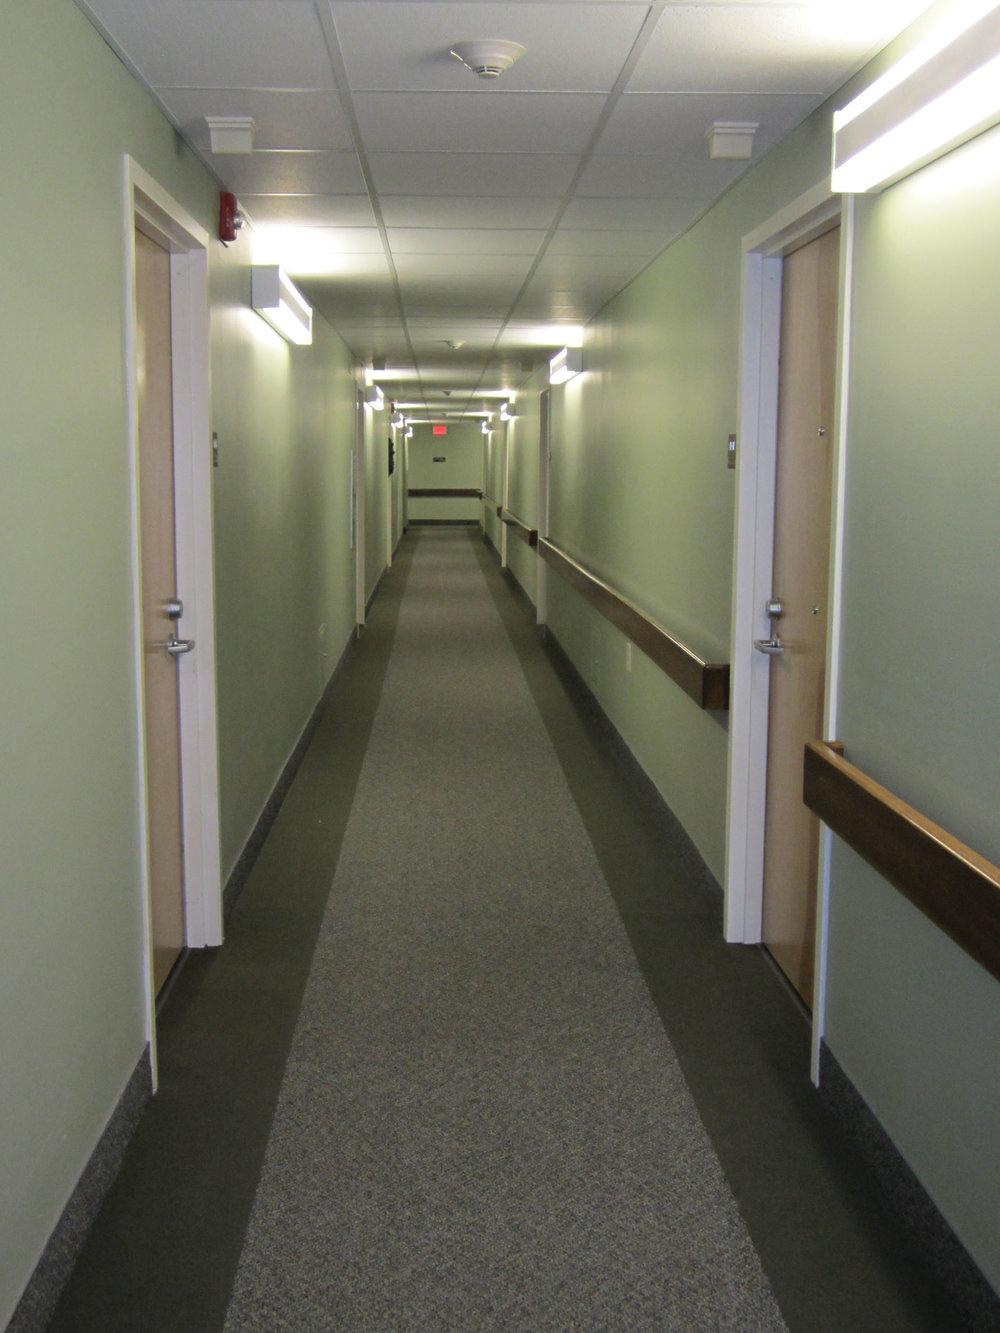 Green Hallway pic_edited-1.jpg